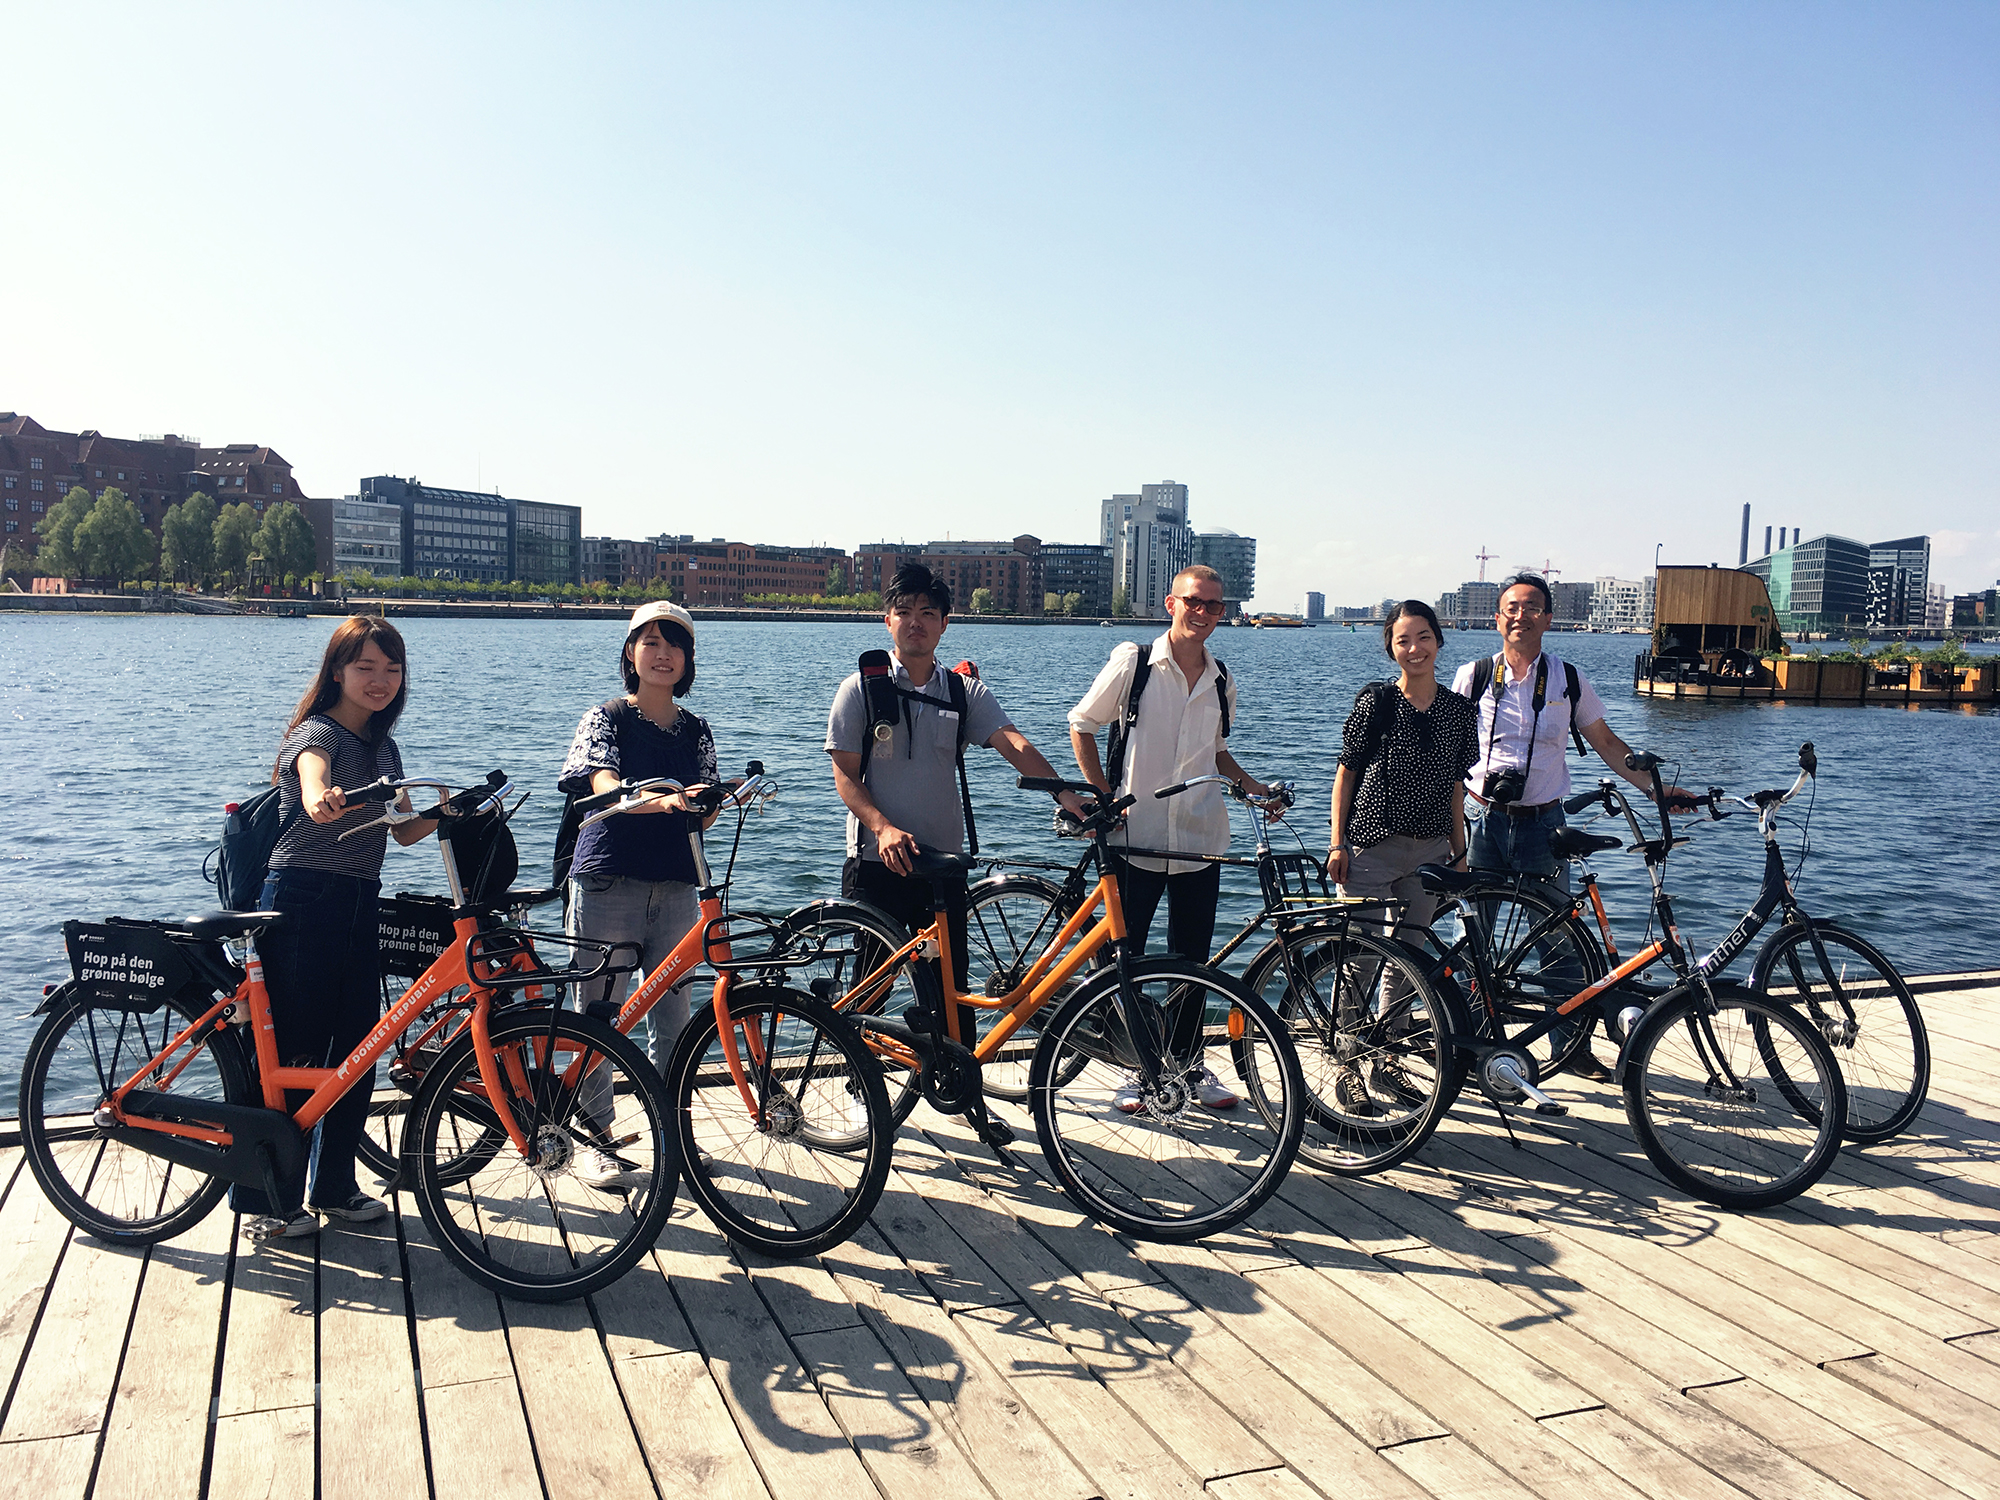 Urban planning students from Kitakyushu, Japan visiting Copenhagen.